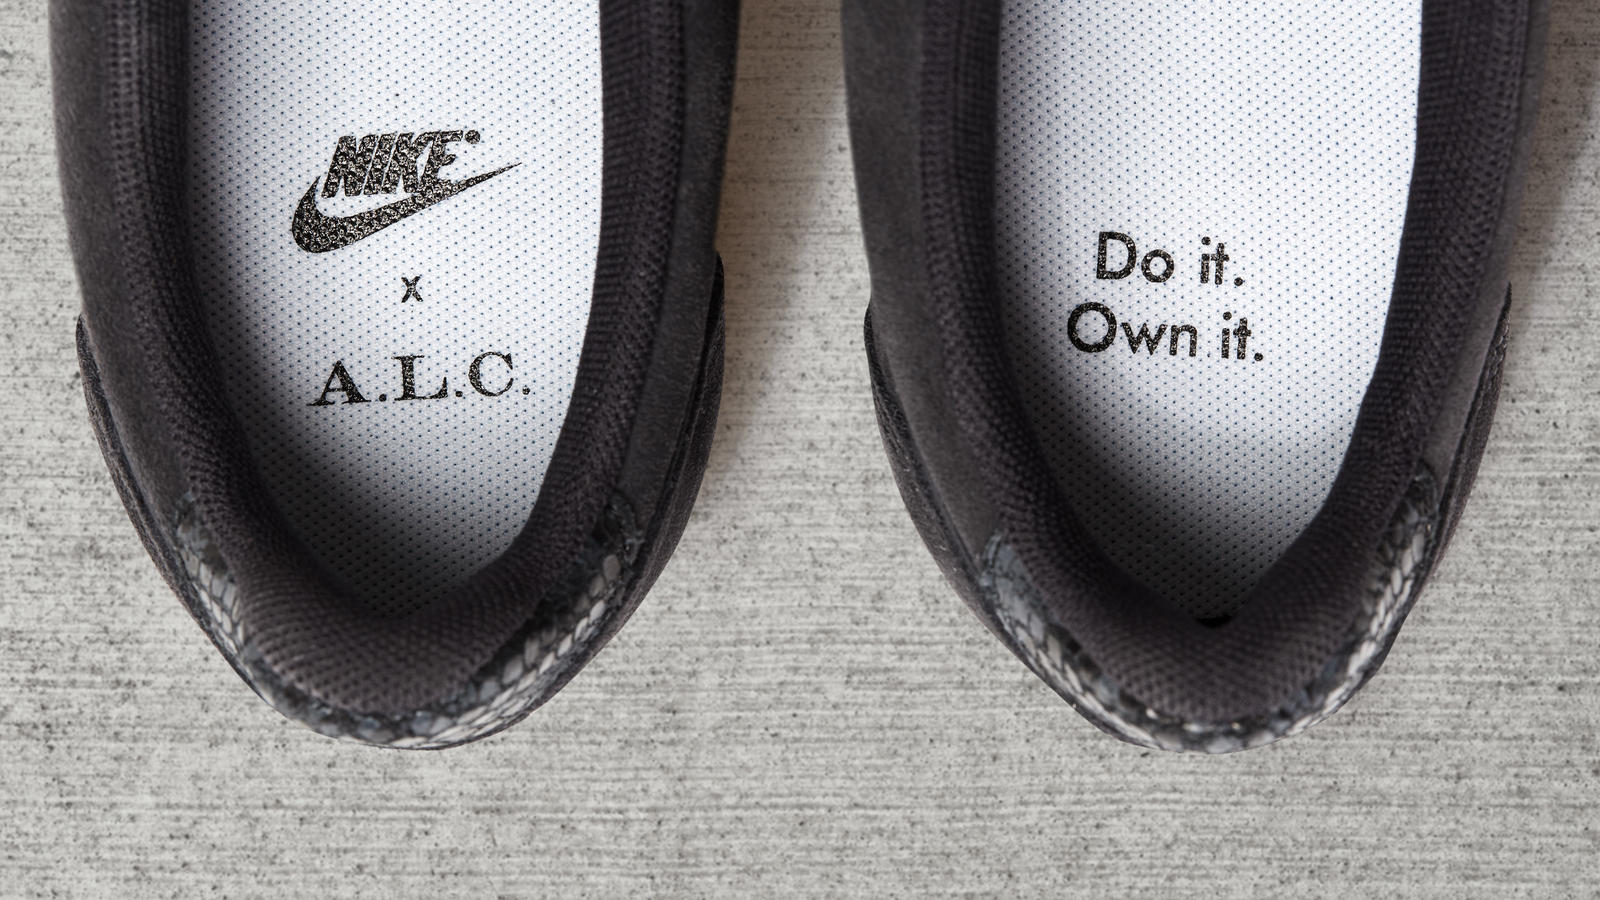 Nike Cortez Classic LX x ALC 3